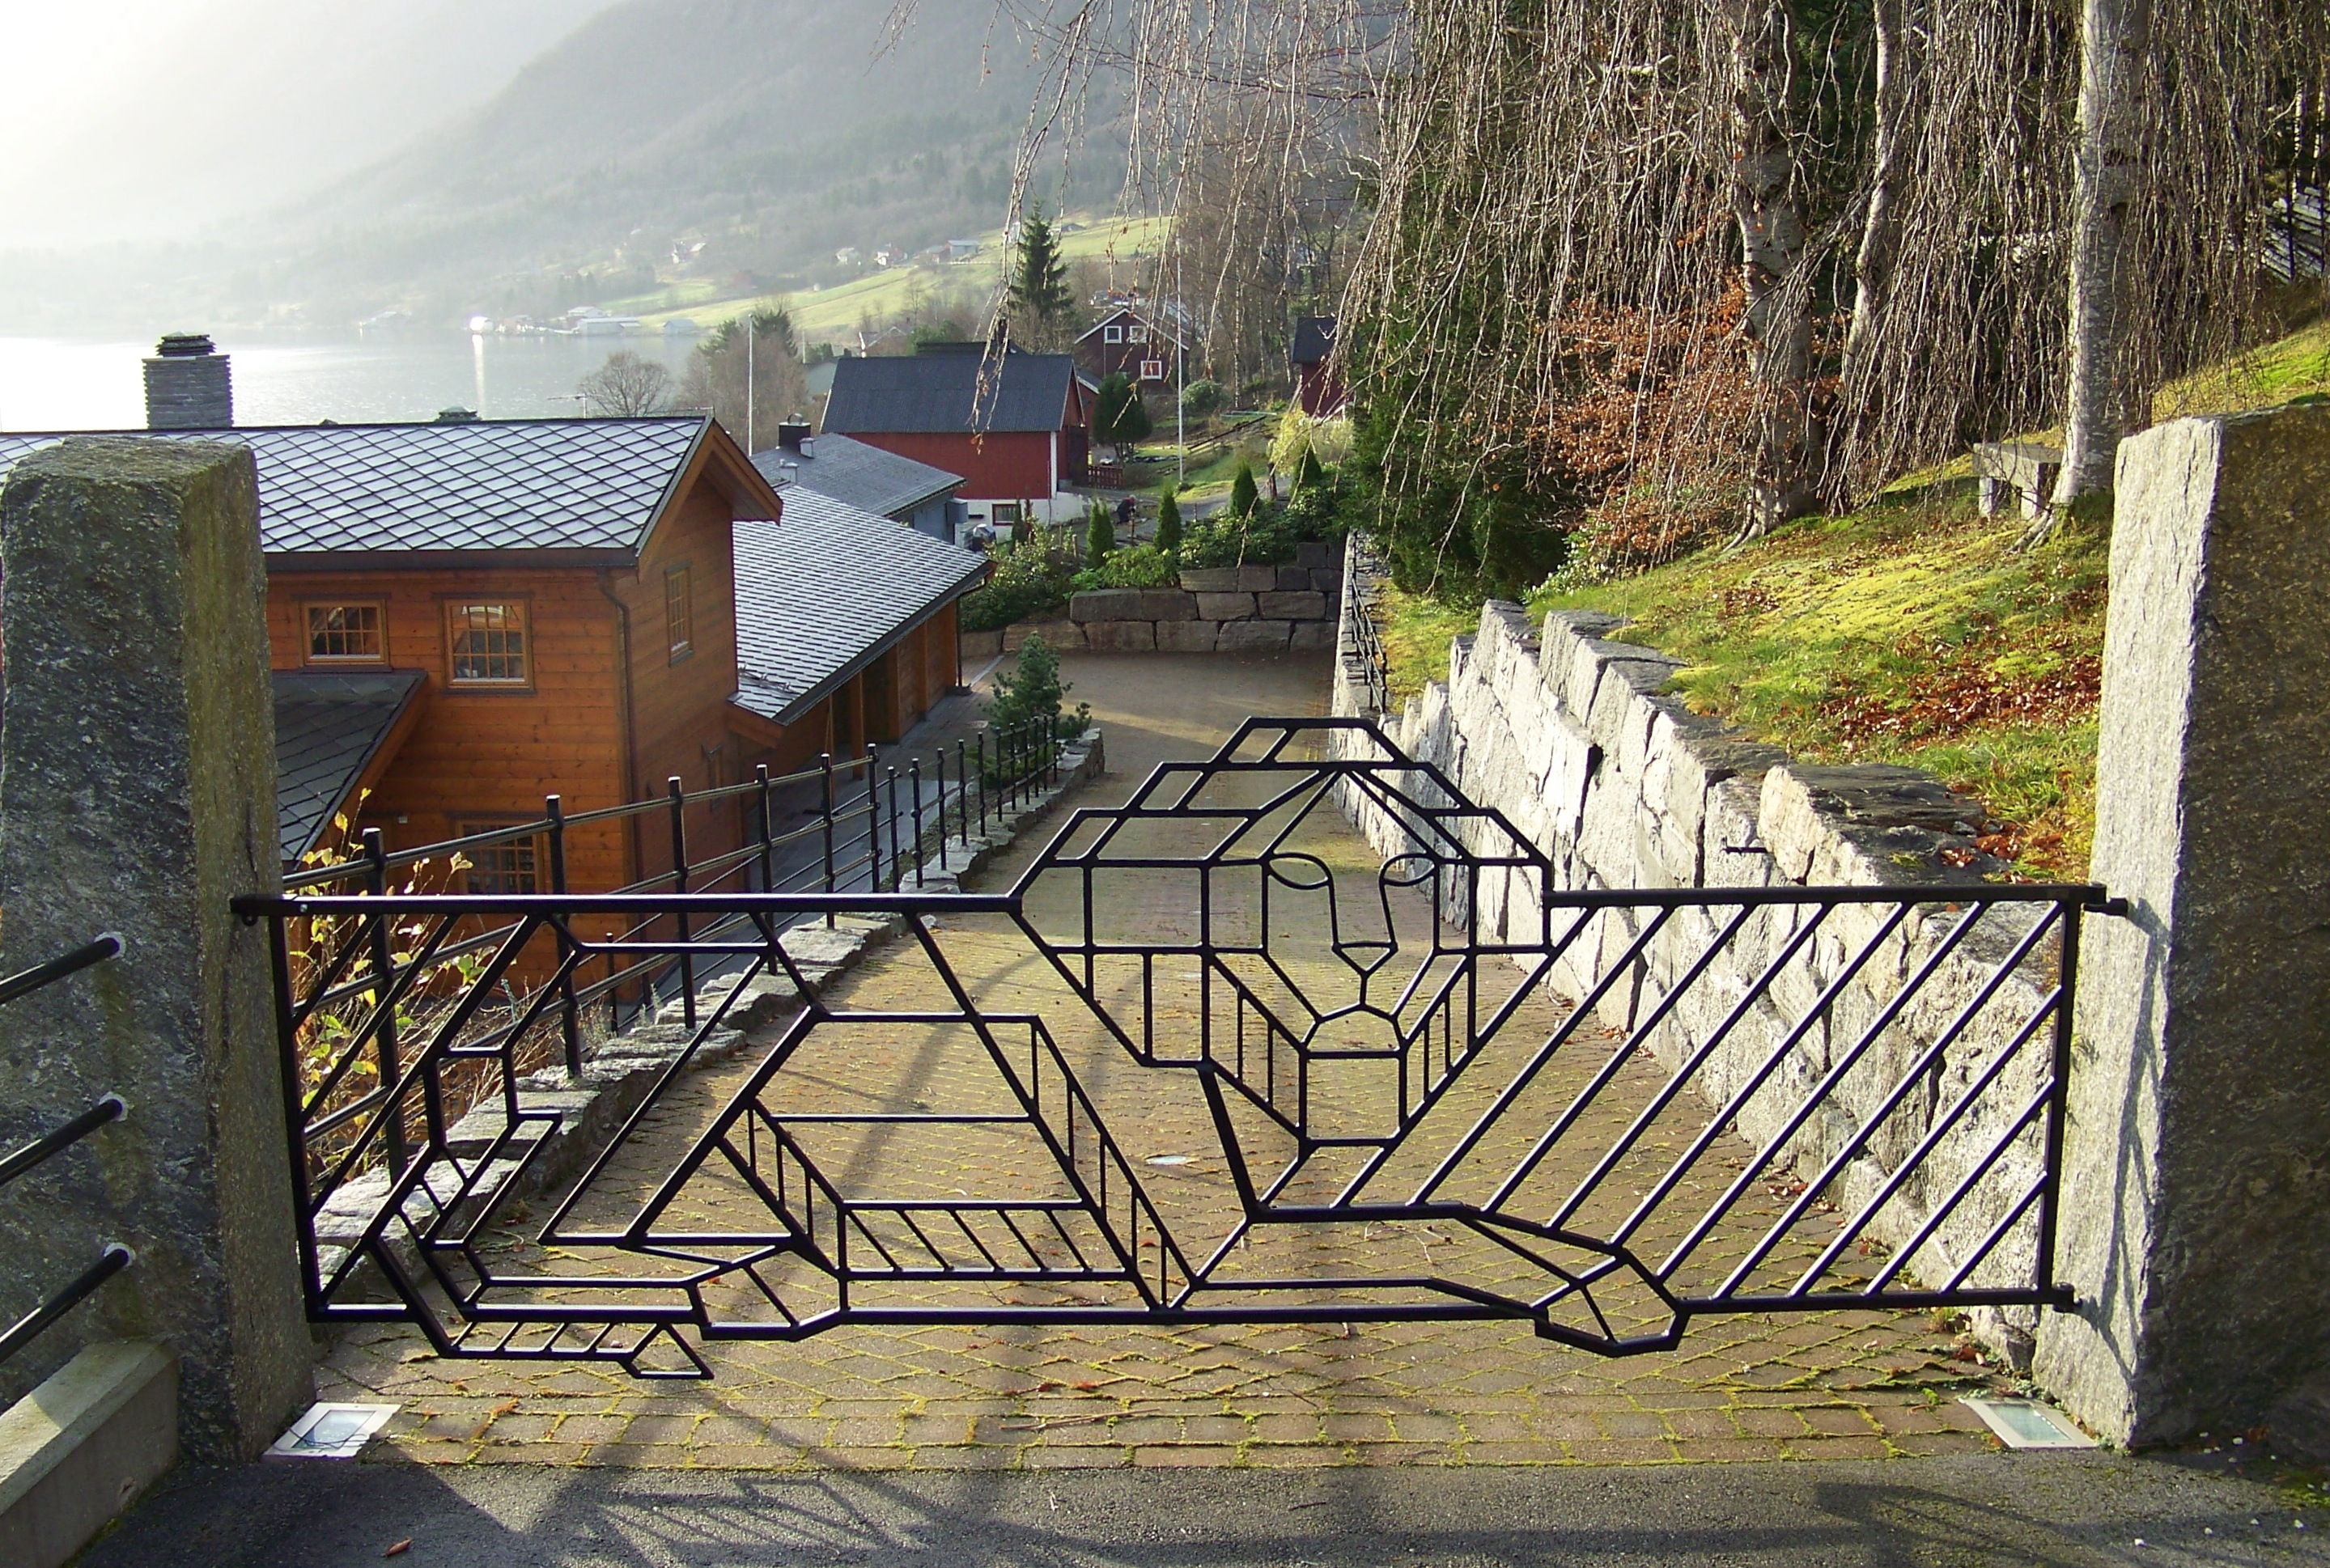 1. Løveport, 2008, 126 x 352 x 3 cm, lakkert stål